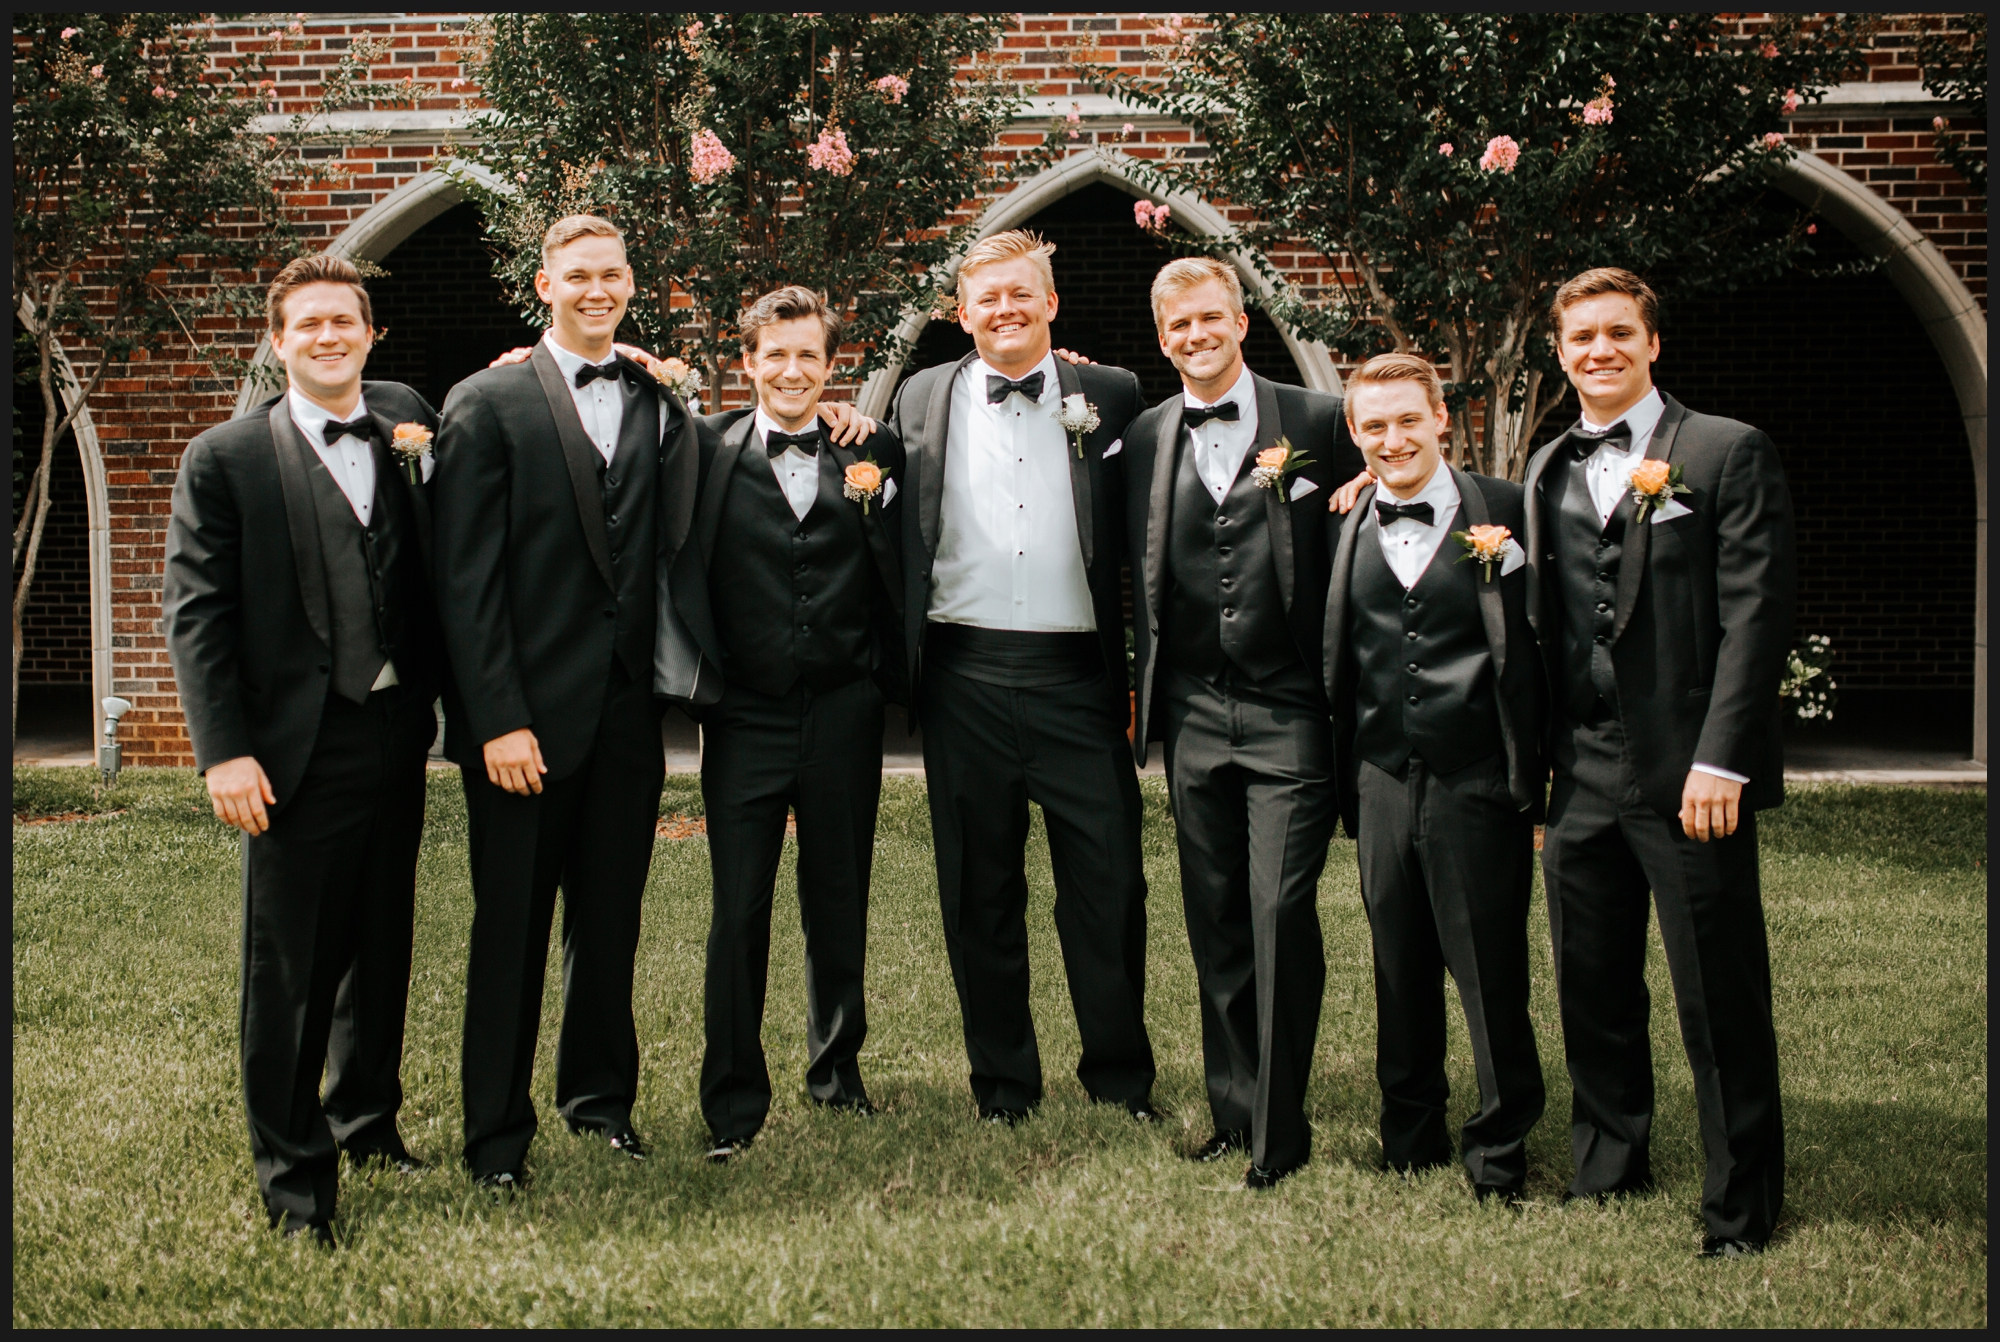 Orlando-Wedding-Photographer-destination-wedding-photographer-florida-wedding-photographer-bohemian-wedding-photographer_0047.jpg